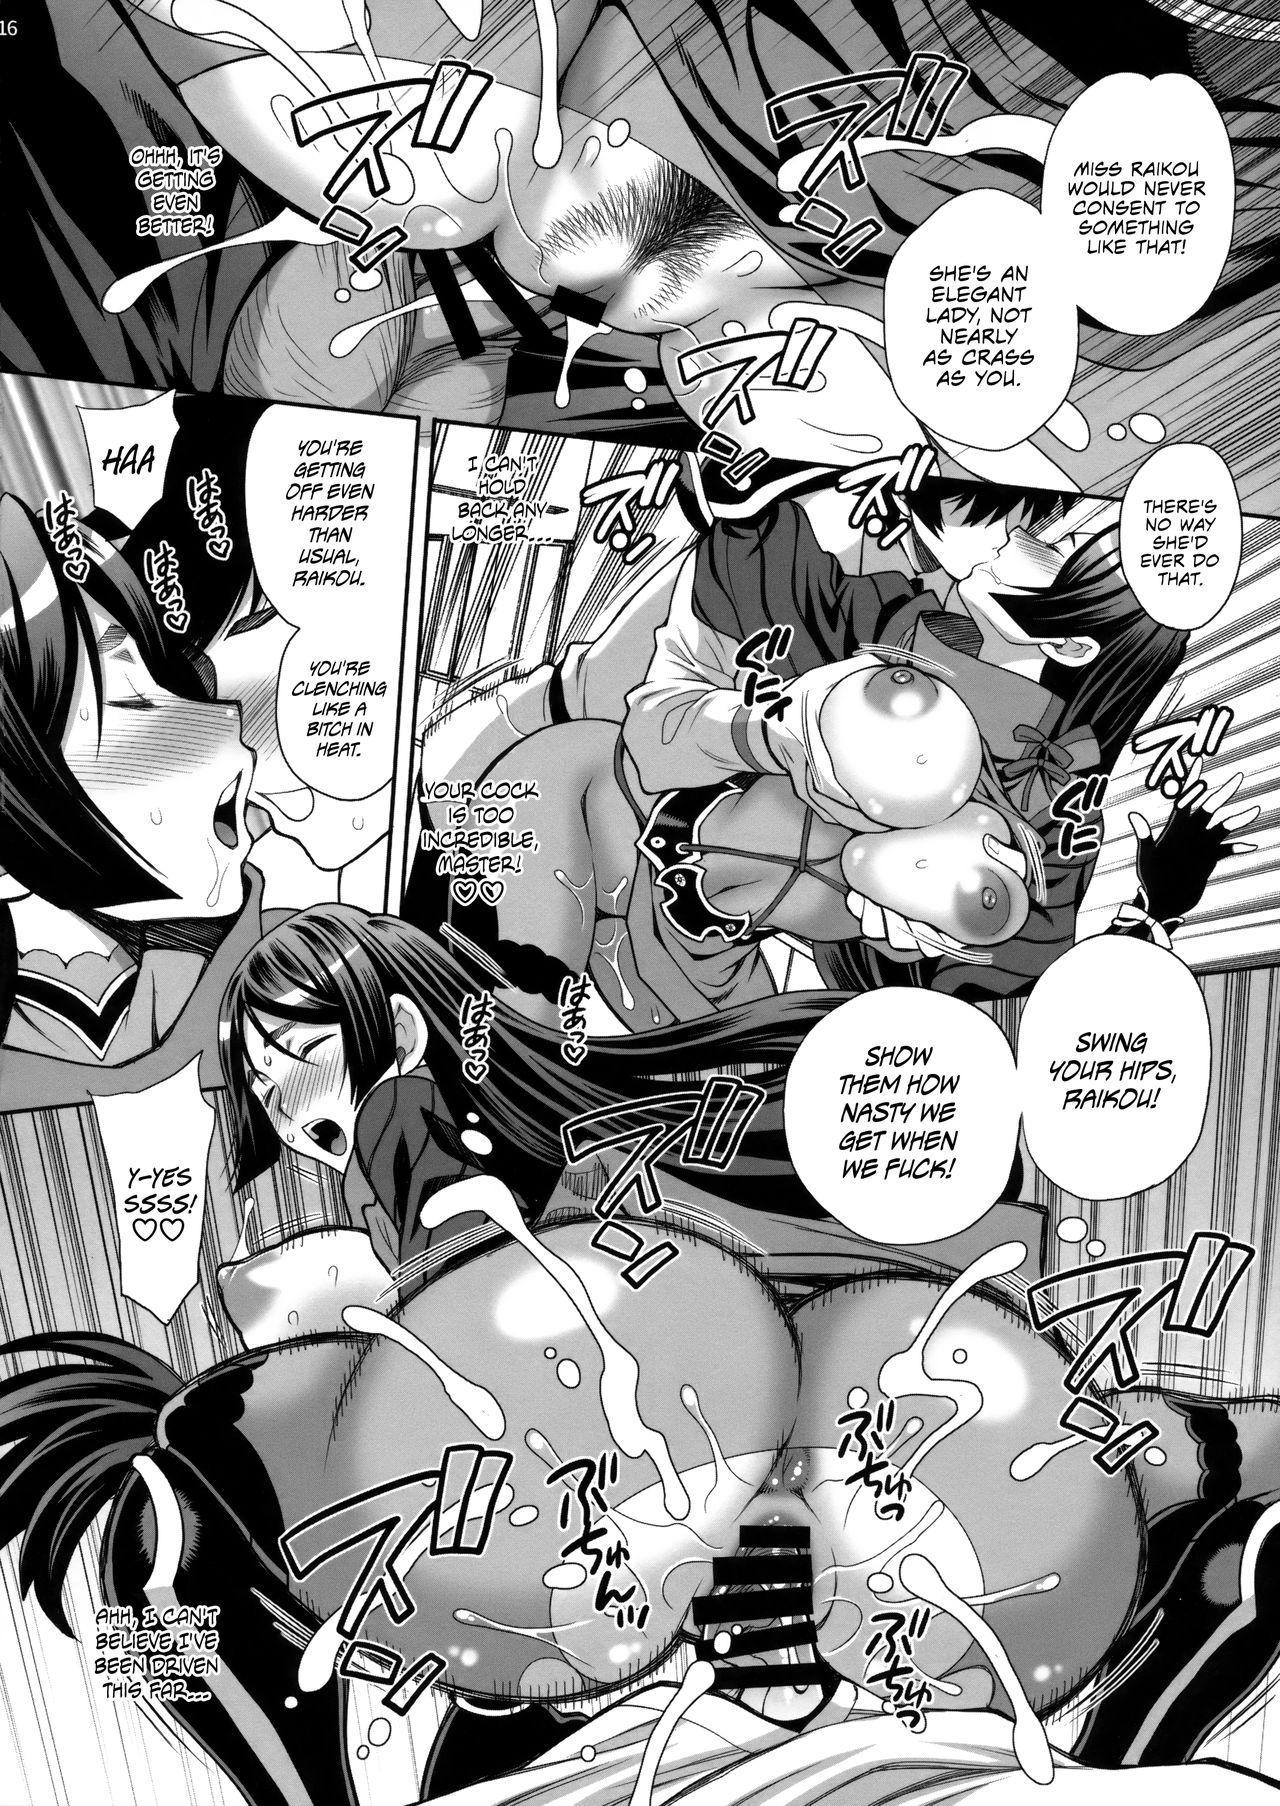 Yukiyanagi no Hon 42 Master, Gokinsei desu yo!   It's Immoral, My Master! Yukiyanagi's Book 42 14